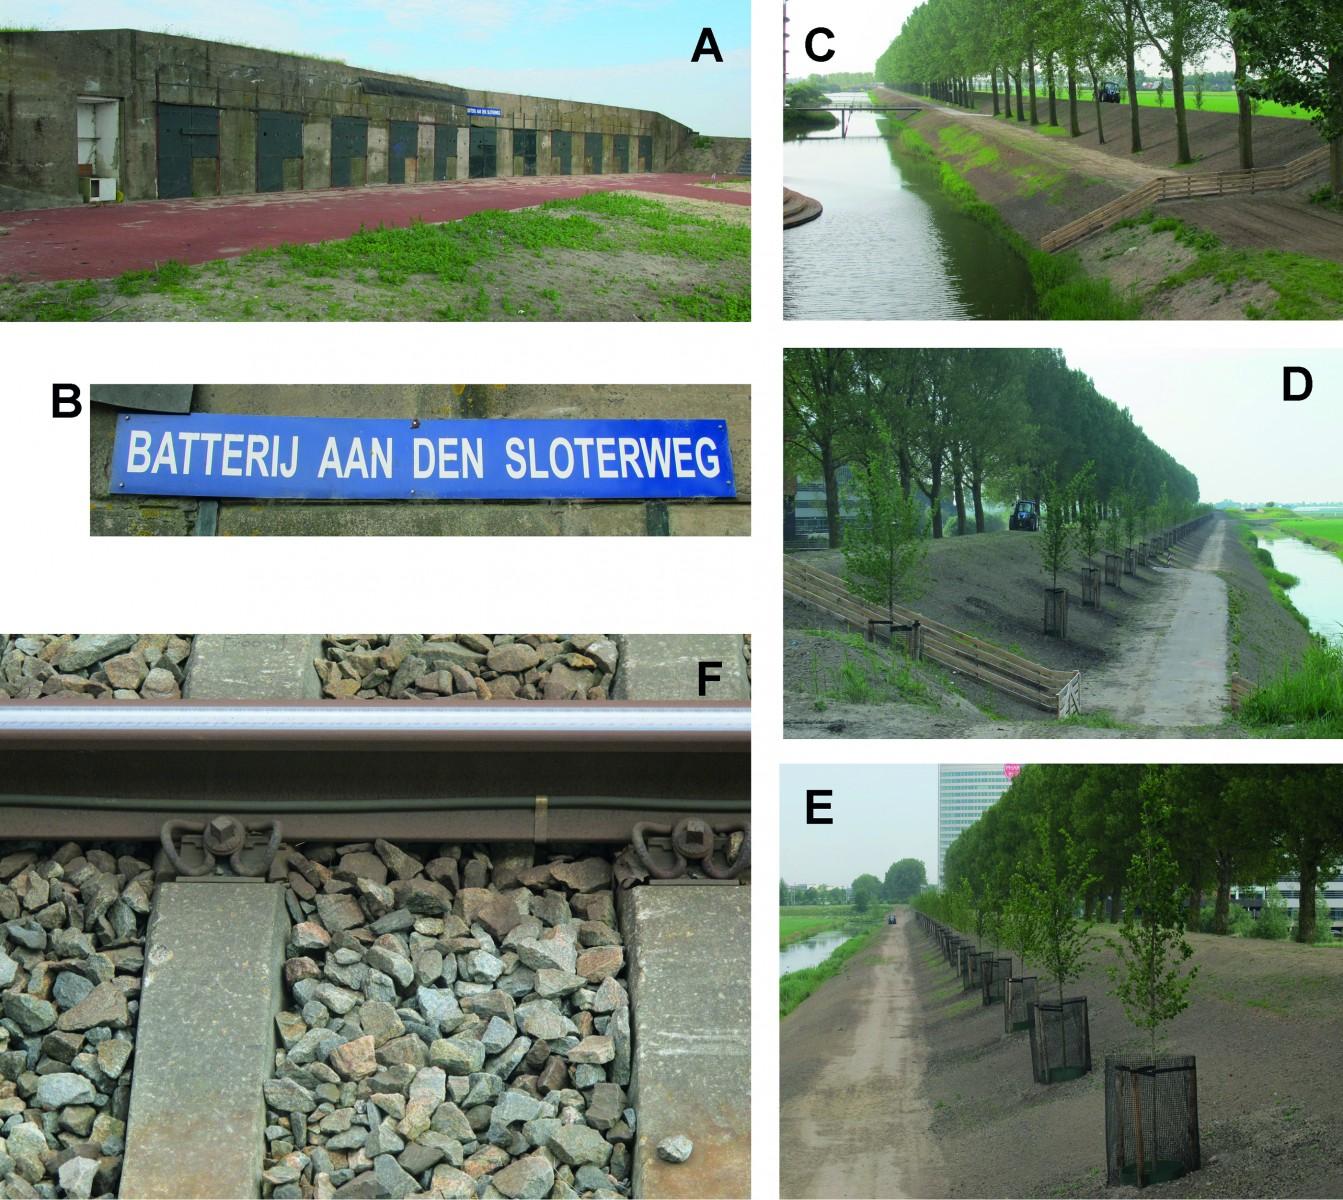 Urban geology: The battery on the Sloterweg